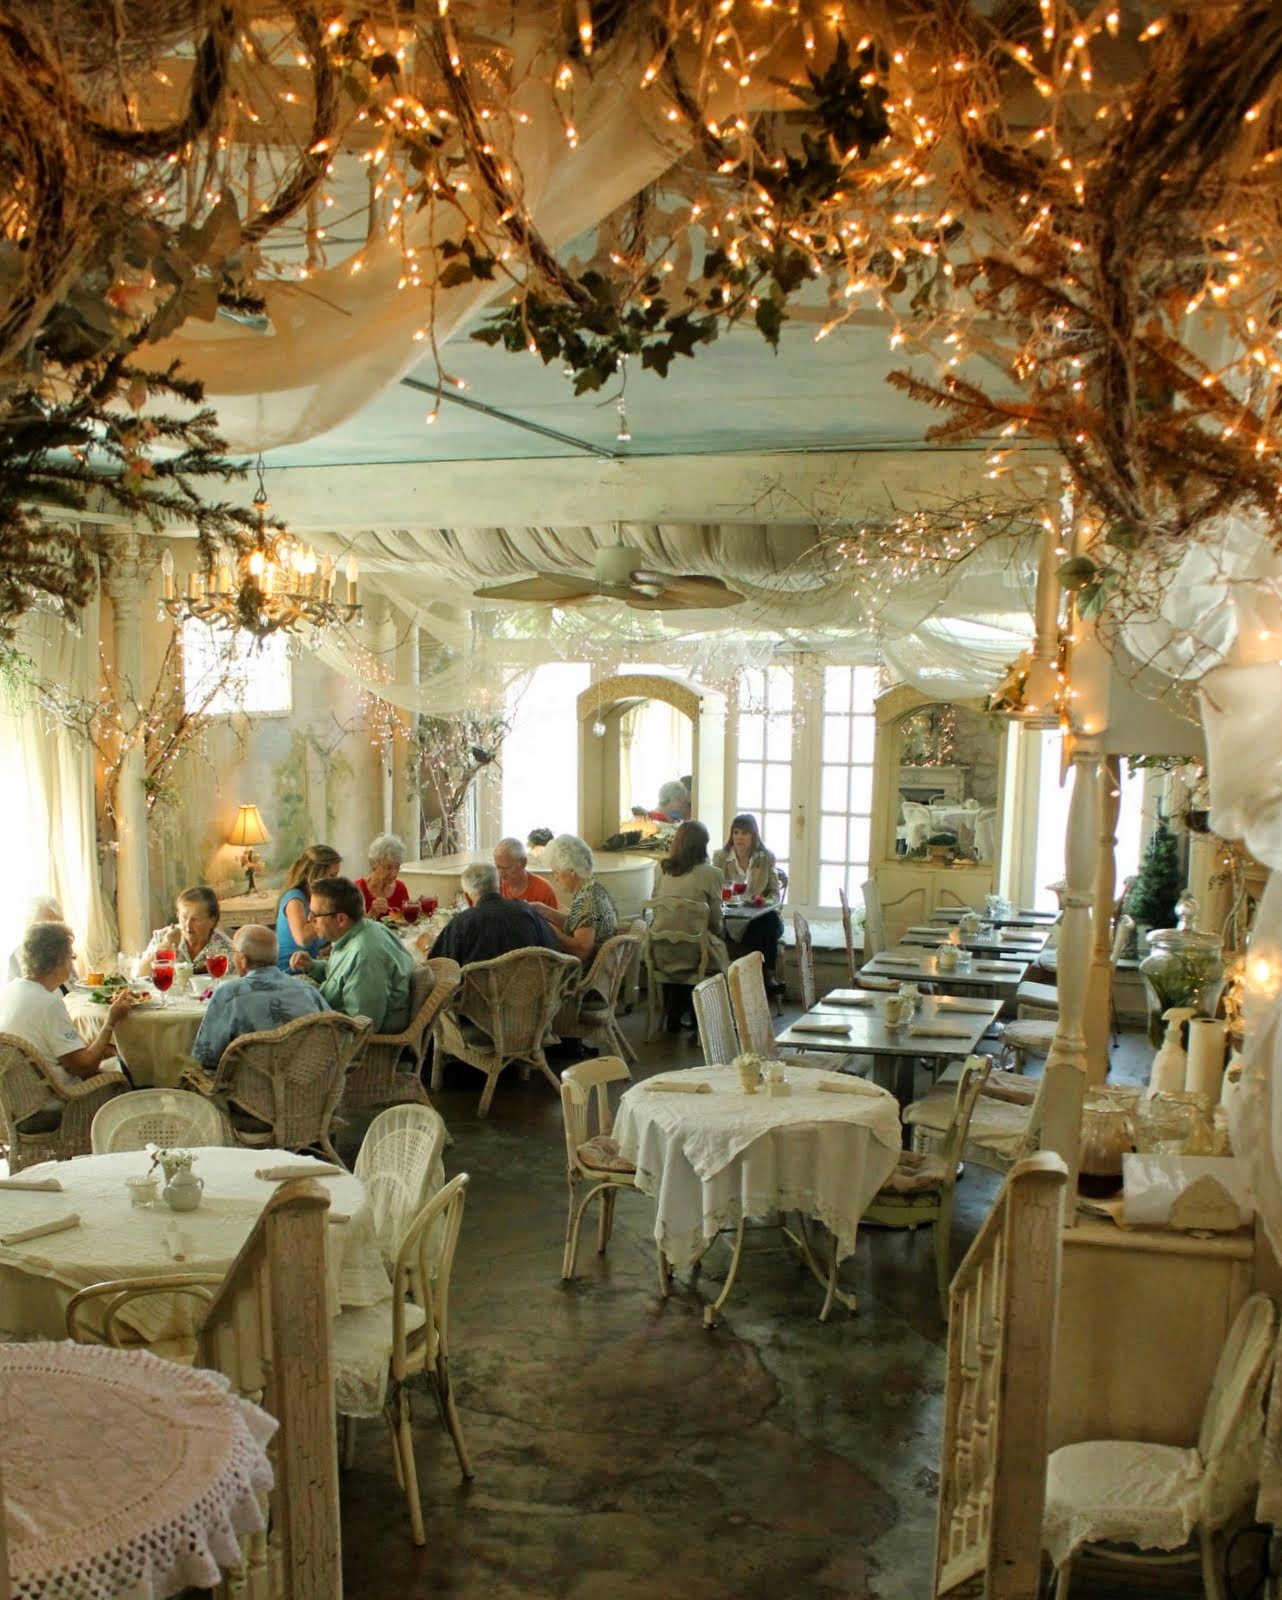 Aiken house gardens april 2014 for Tea room interior design ideas